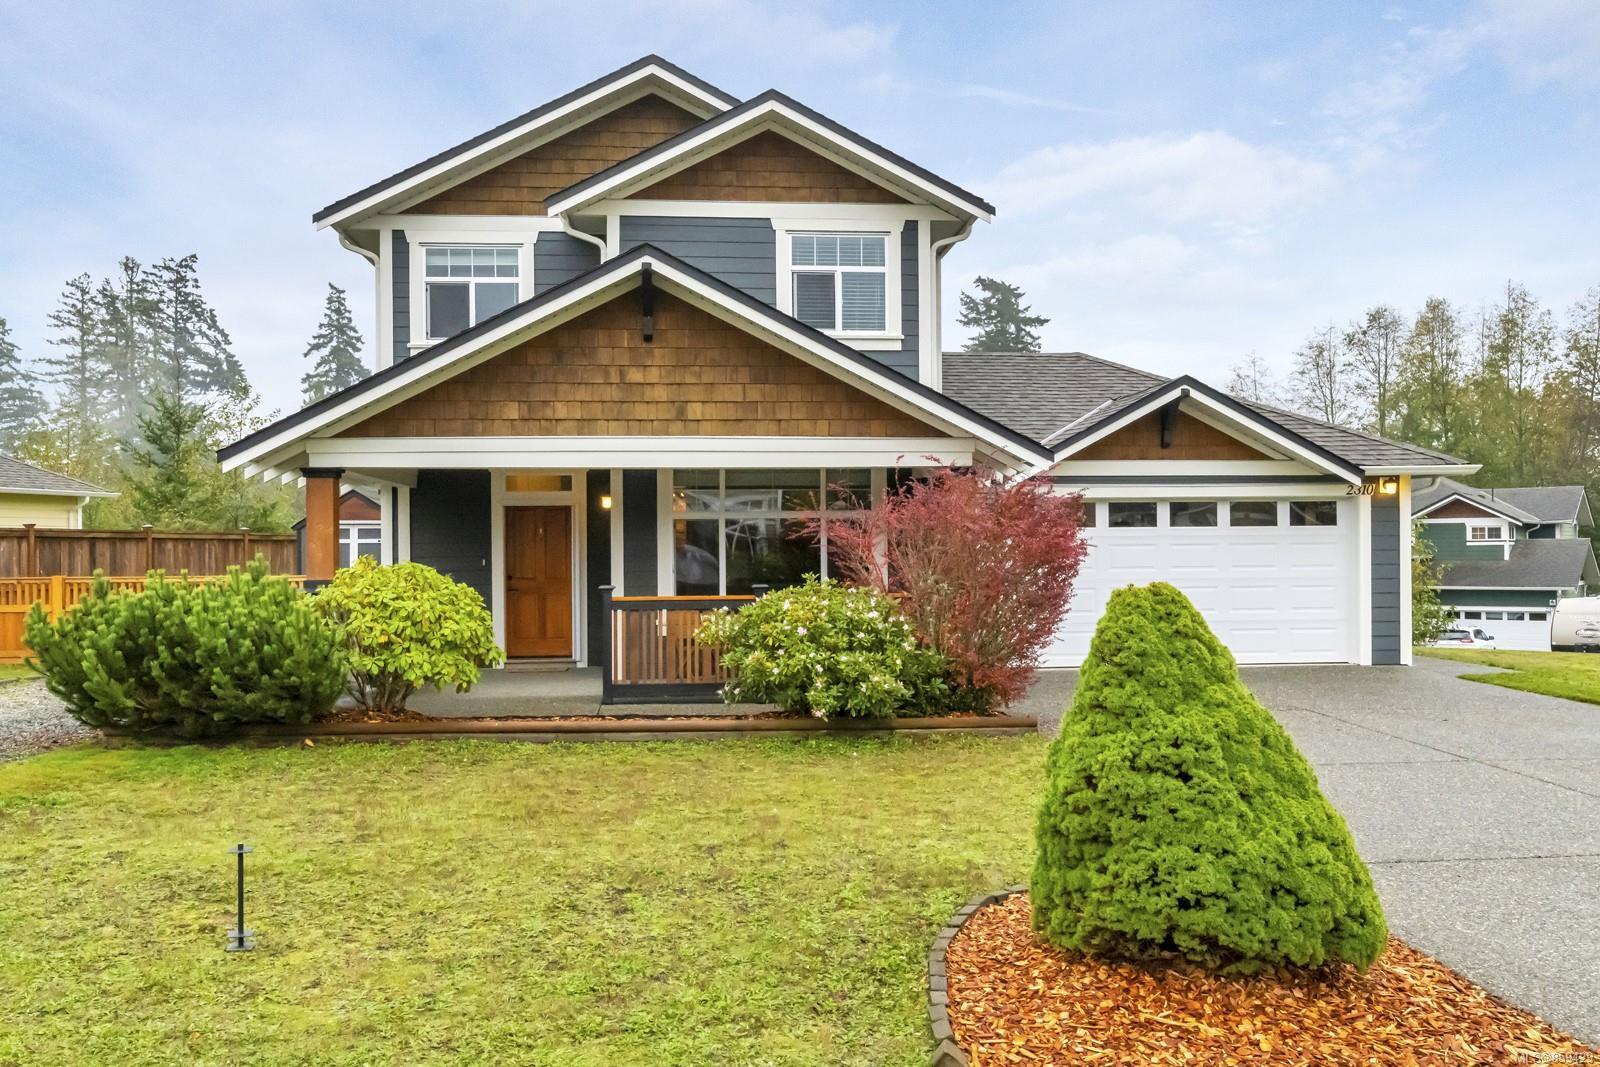 Main Photo: 2310 Demamiel Pl in : Sk Sunriver House for sale (Sooke)  : MLS®# 859429